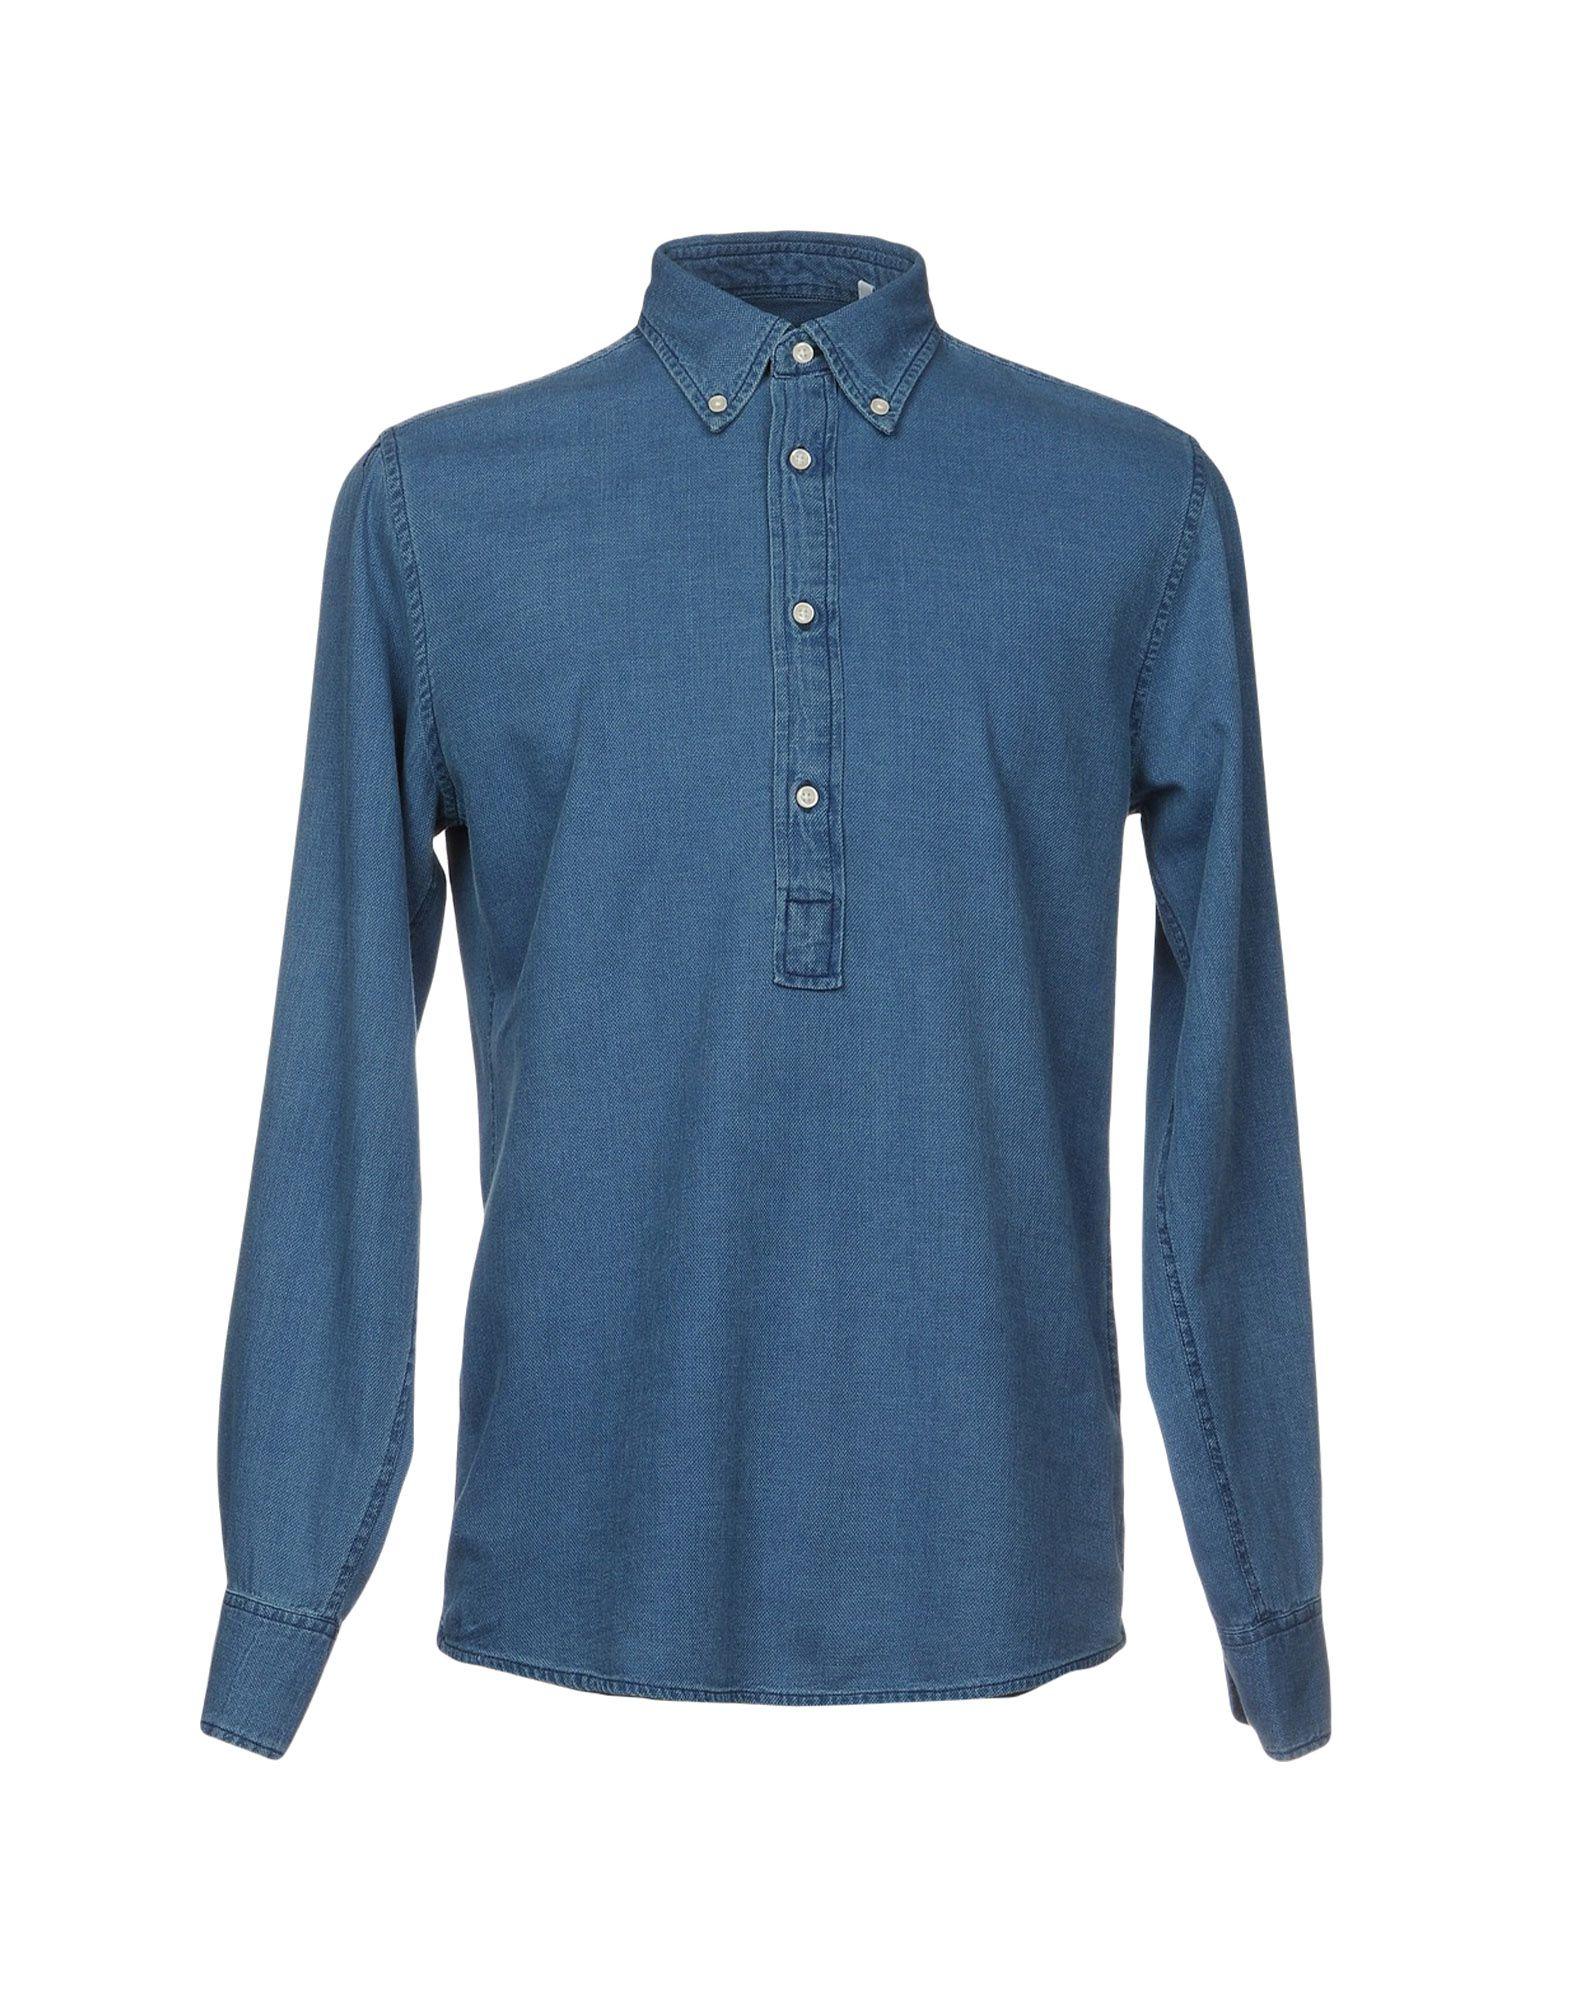 Camicia Camicia Camicia Tinta Unita Deperlu Uomo - 38698878VG be8043